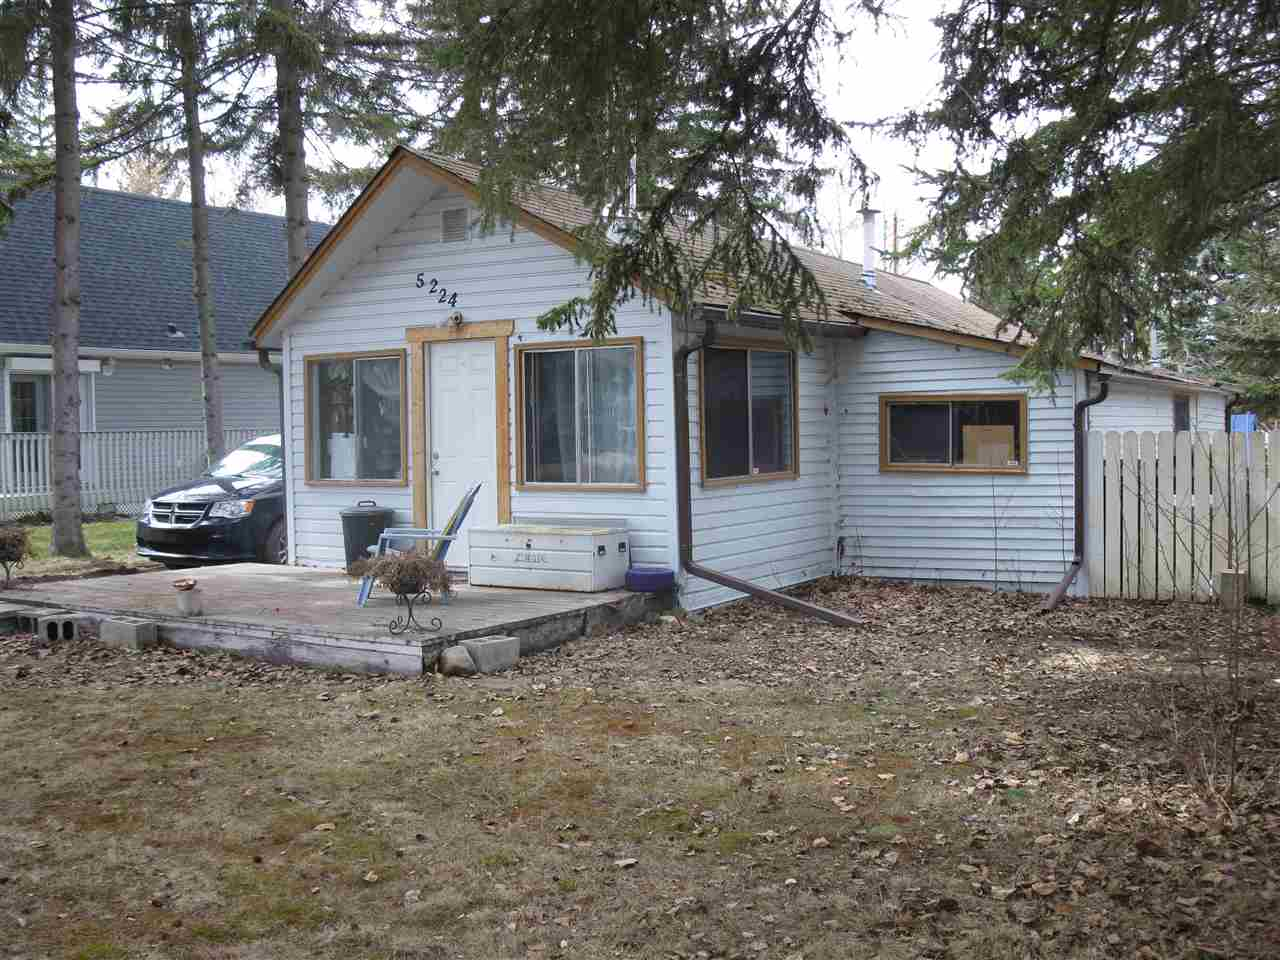 5224 48 Ave, Rural Lac Ste. Anne County, MLS® # E4152474